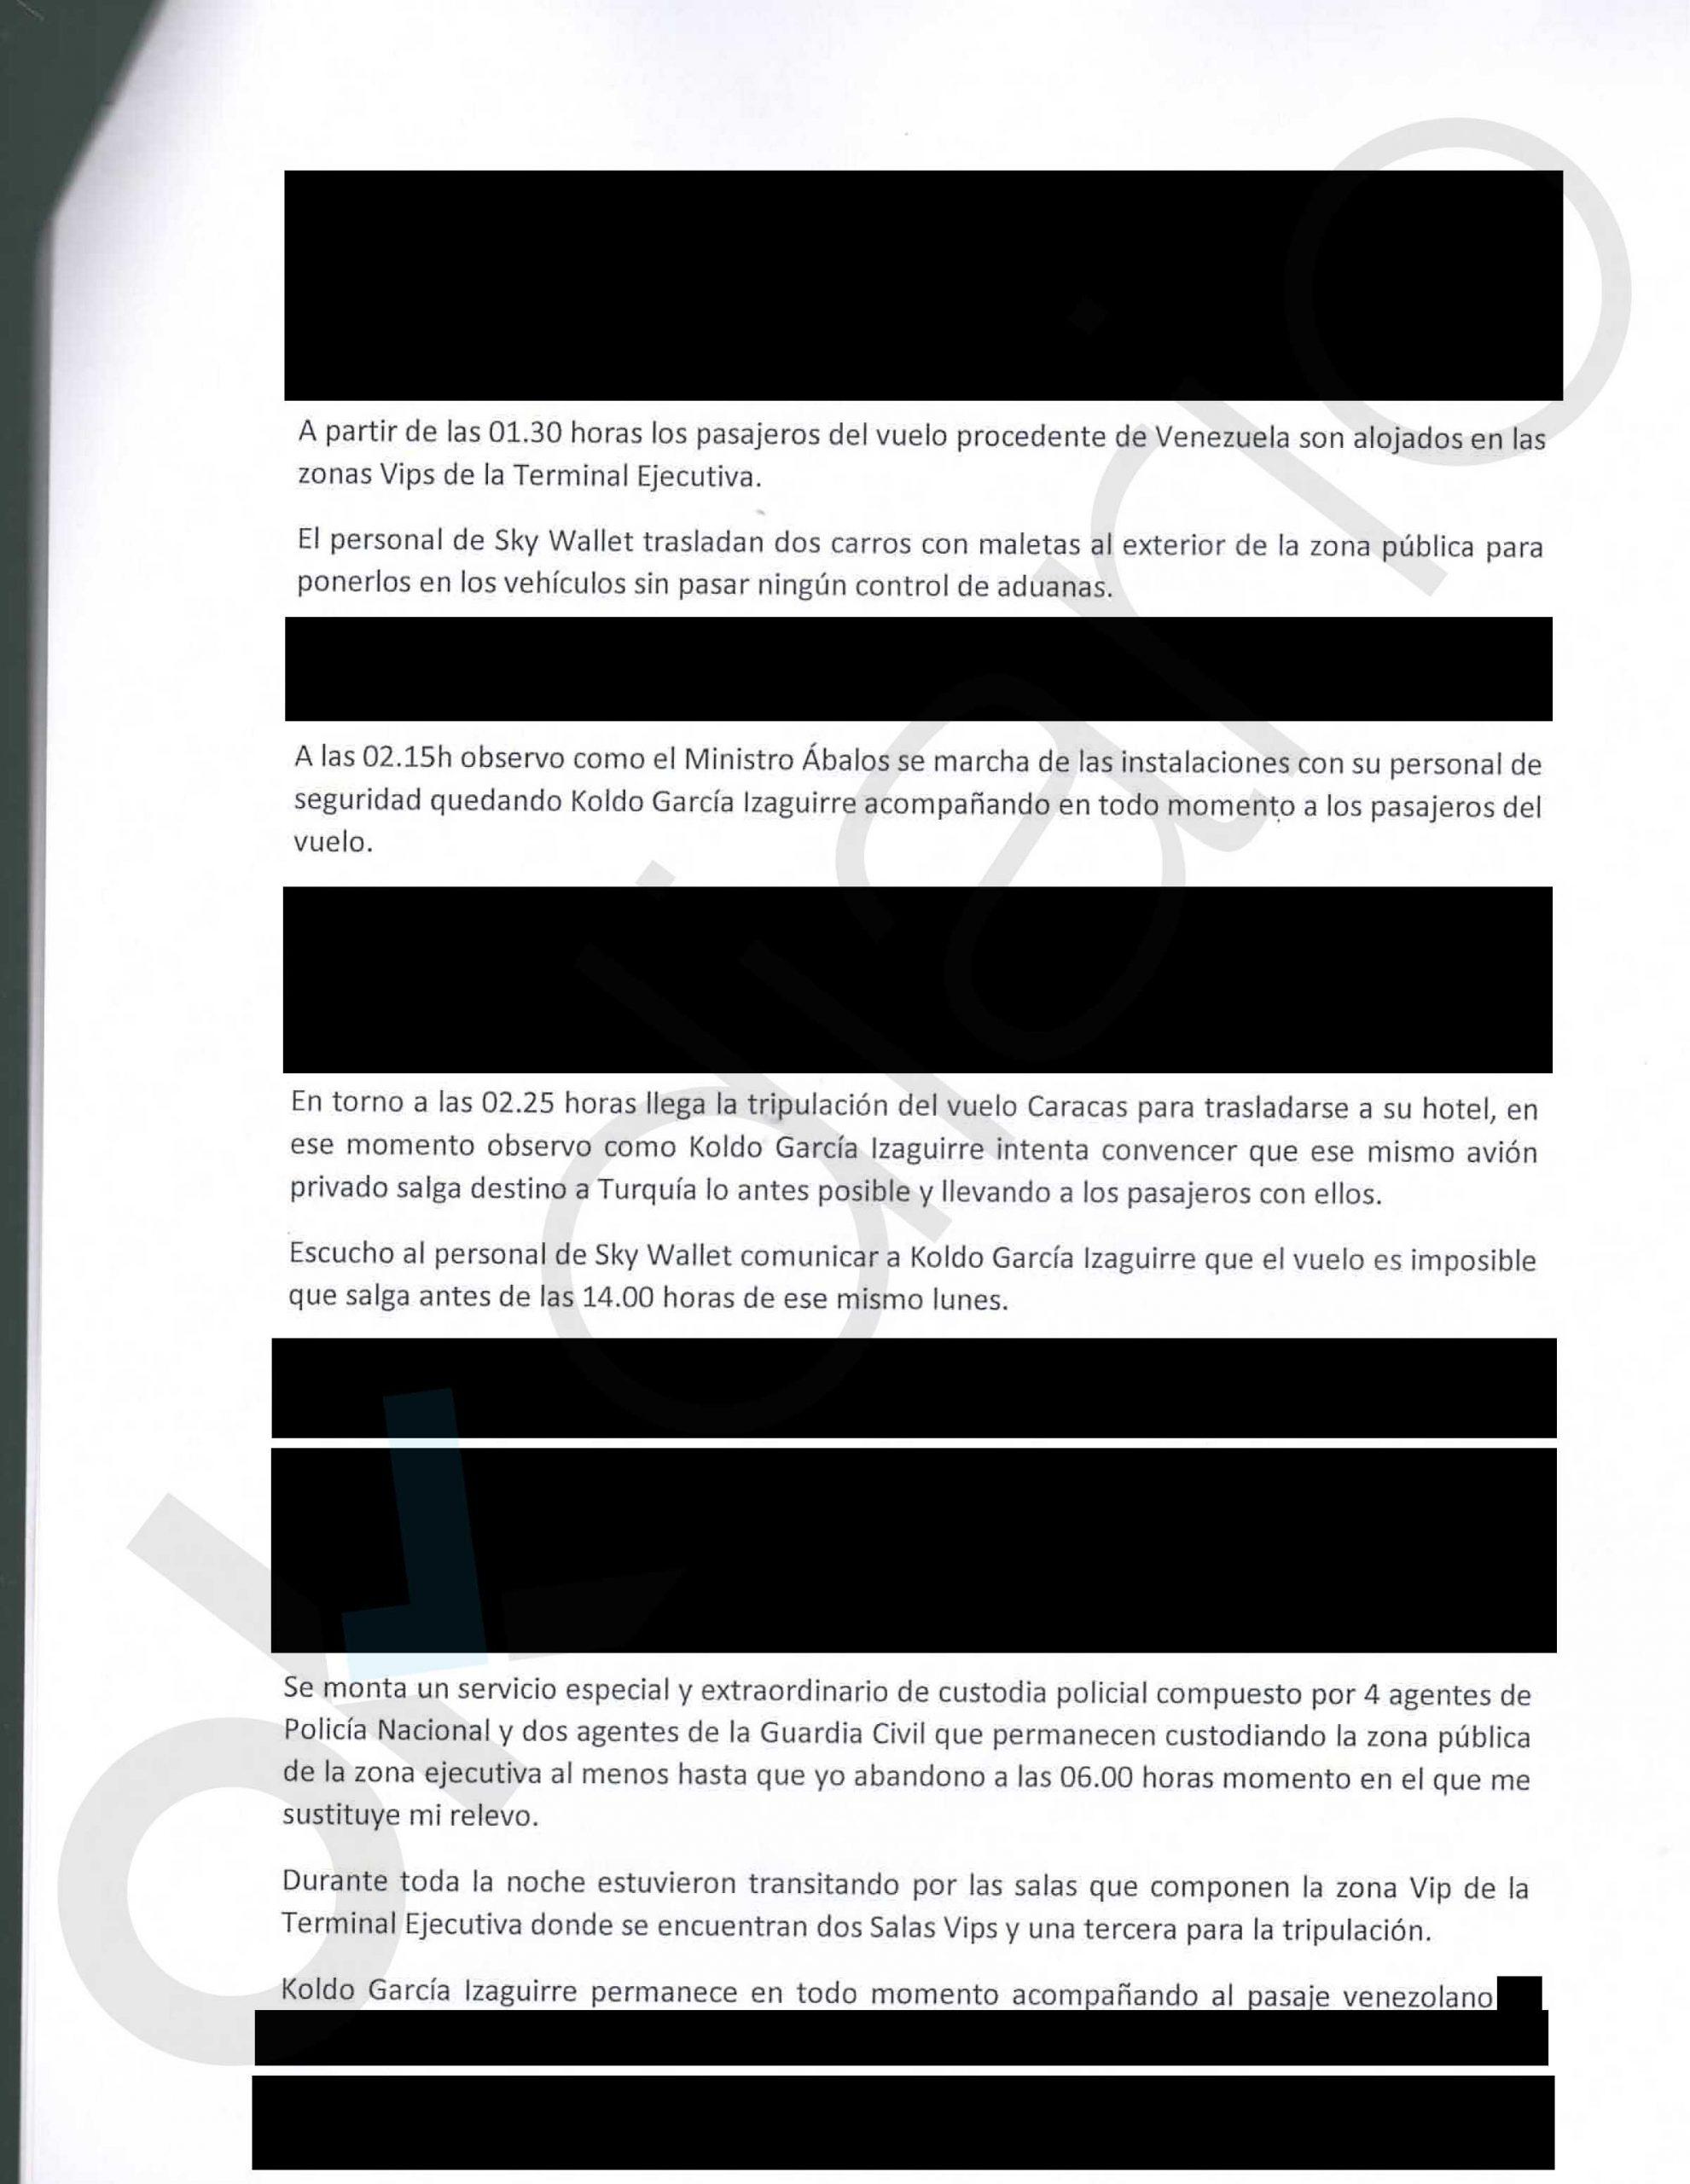 Un testigo declara ante notario que Delcy pisó suelo Schengen y que introdujo 2 carros de maletas en España